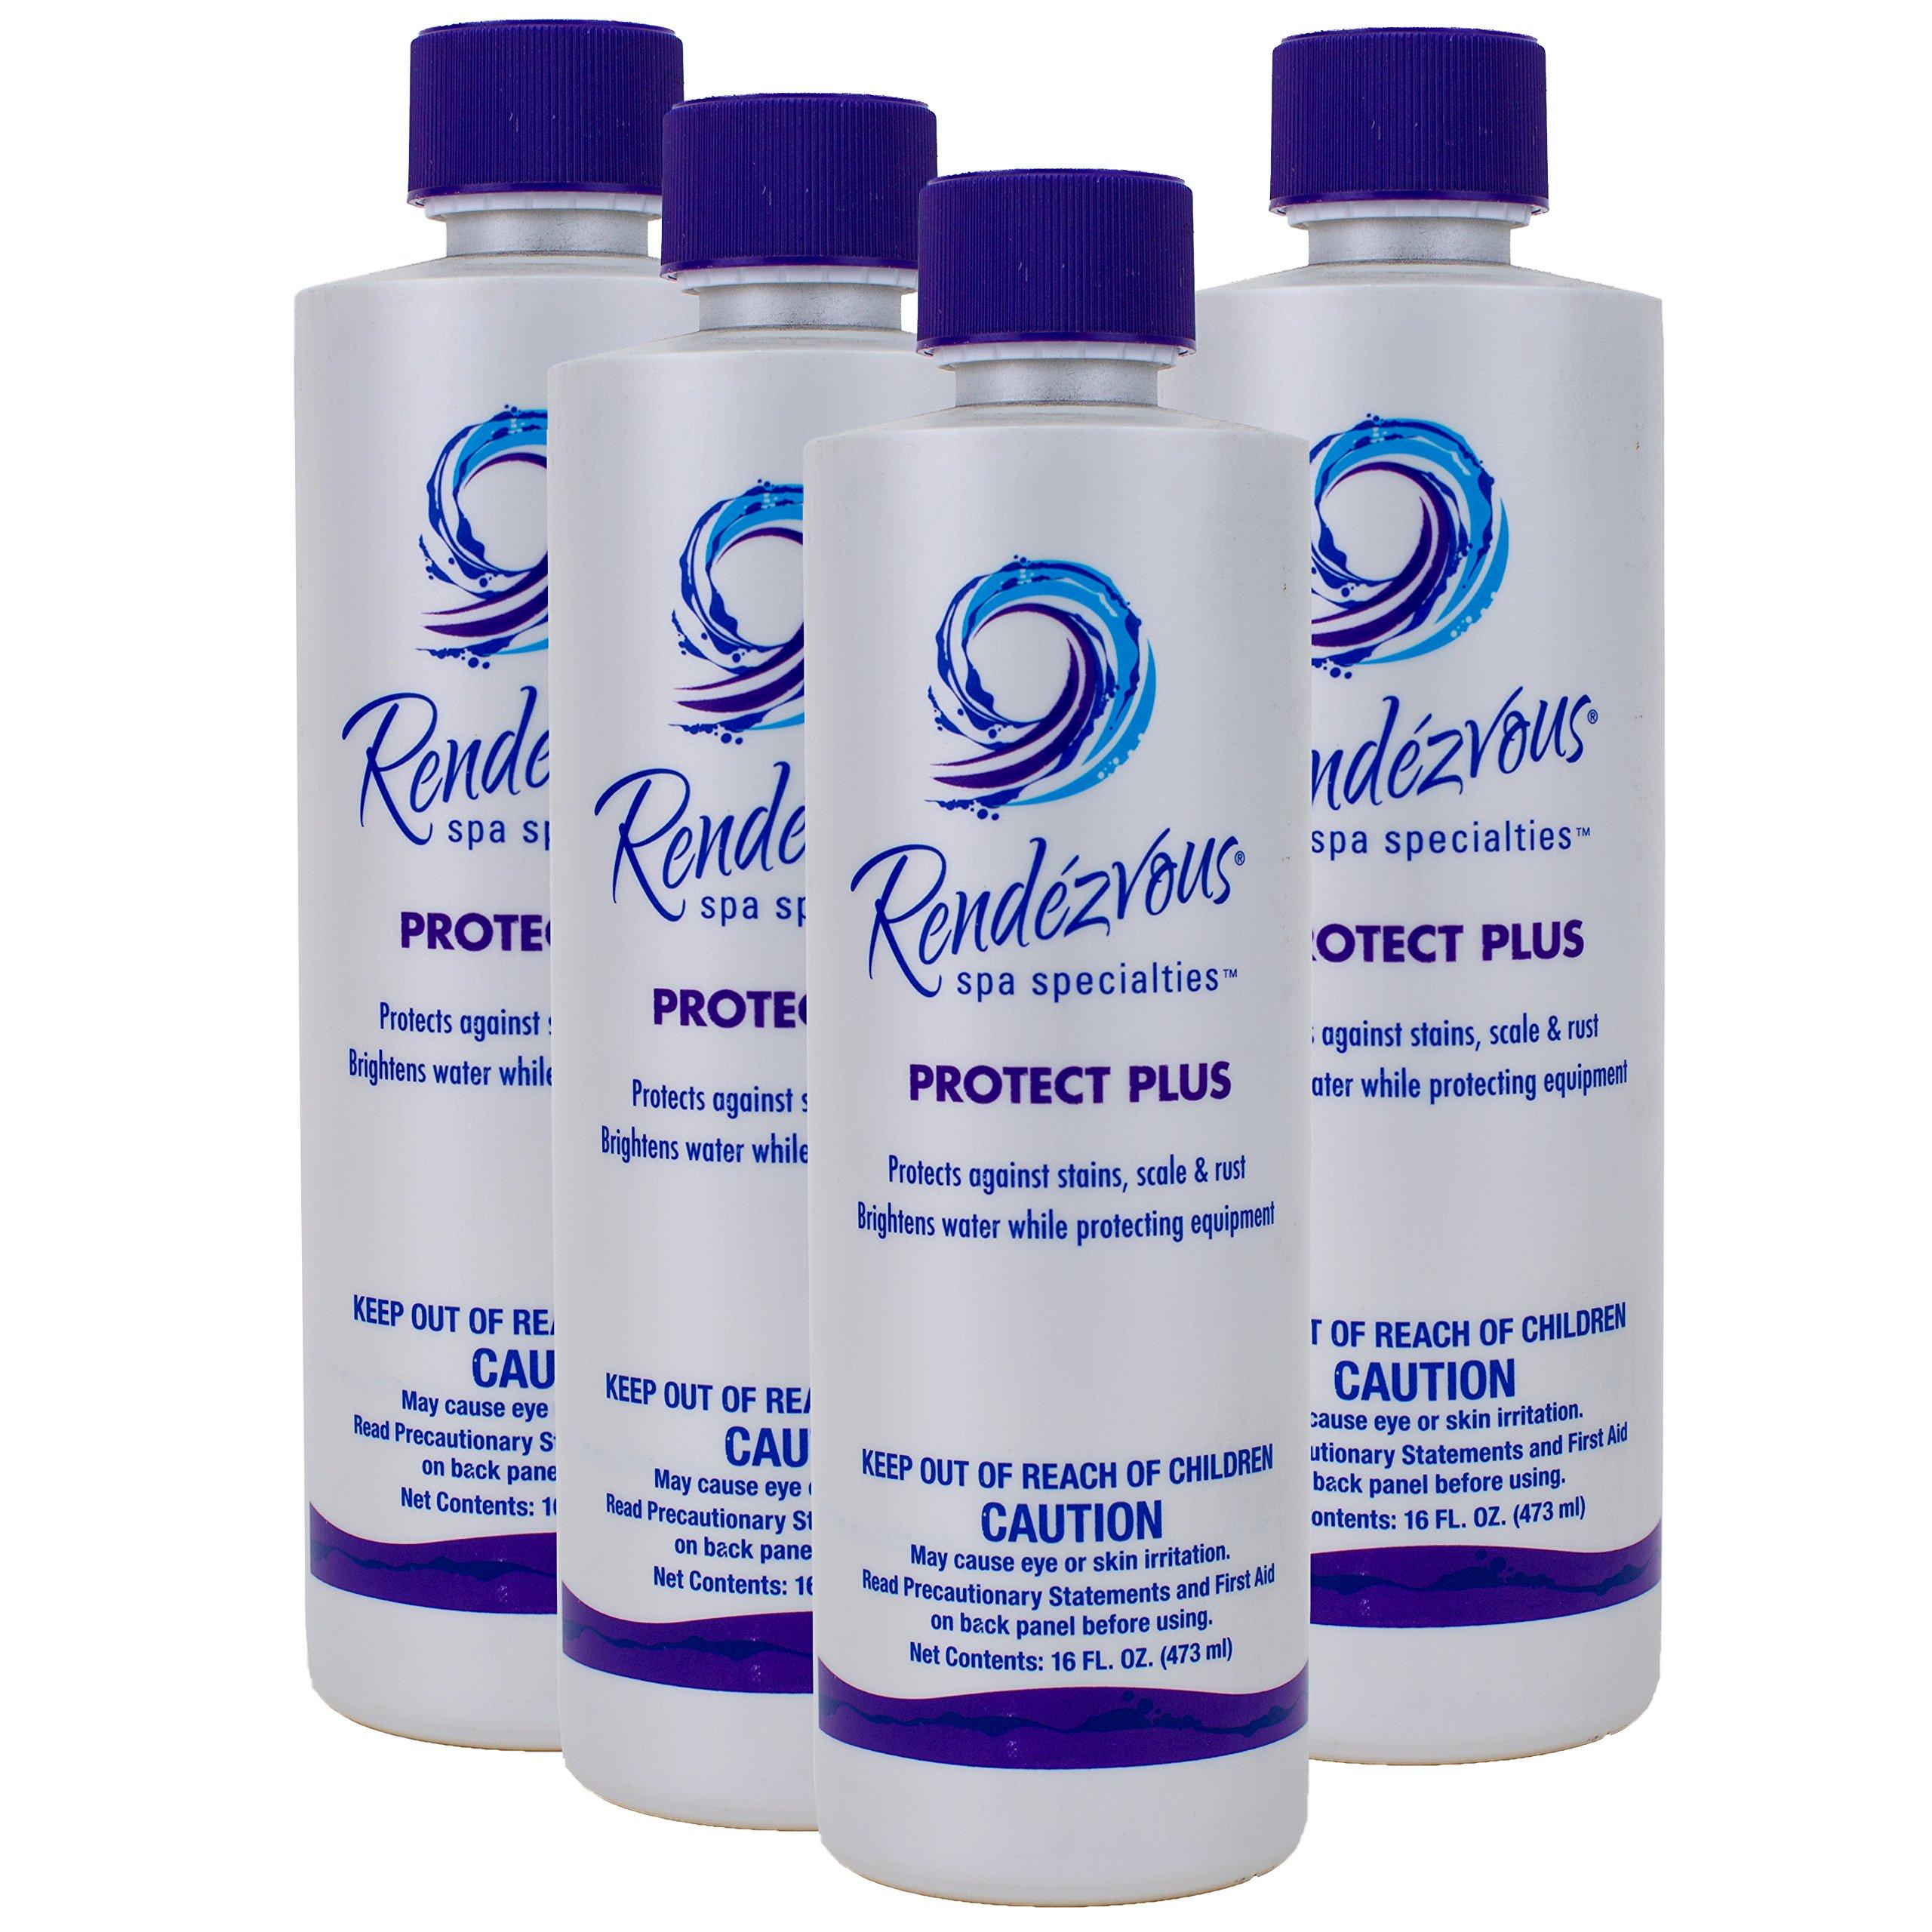 Rendezvous Spa Specialties Protect Plus (1 pt) (4 Pack) by Rendezvous Spa Specialties